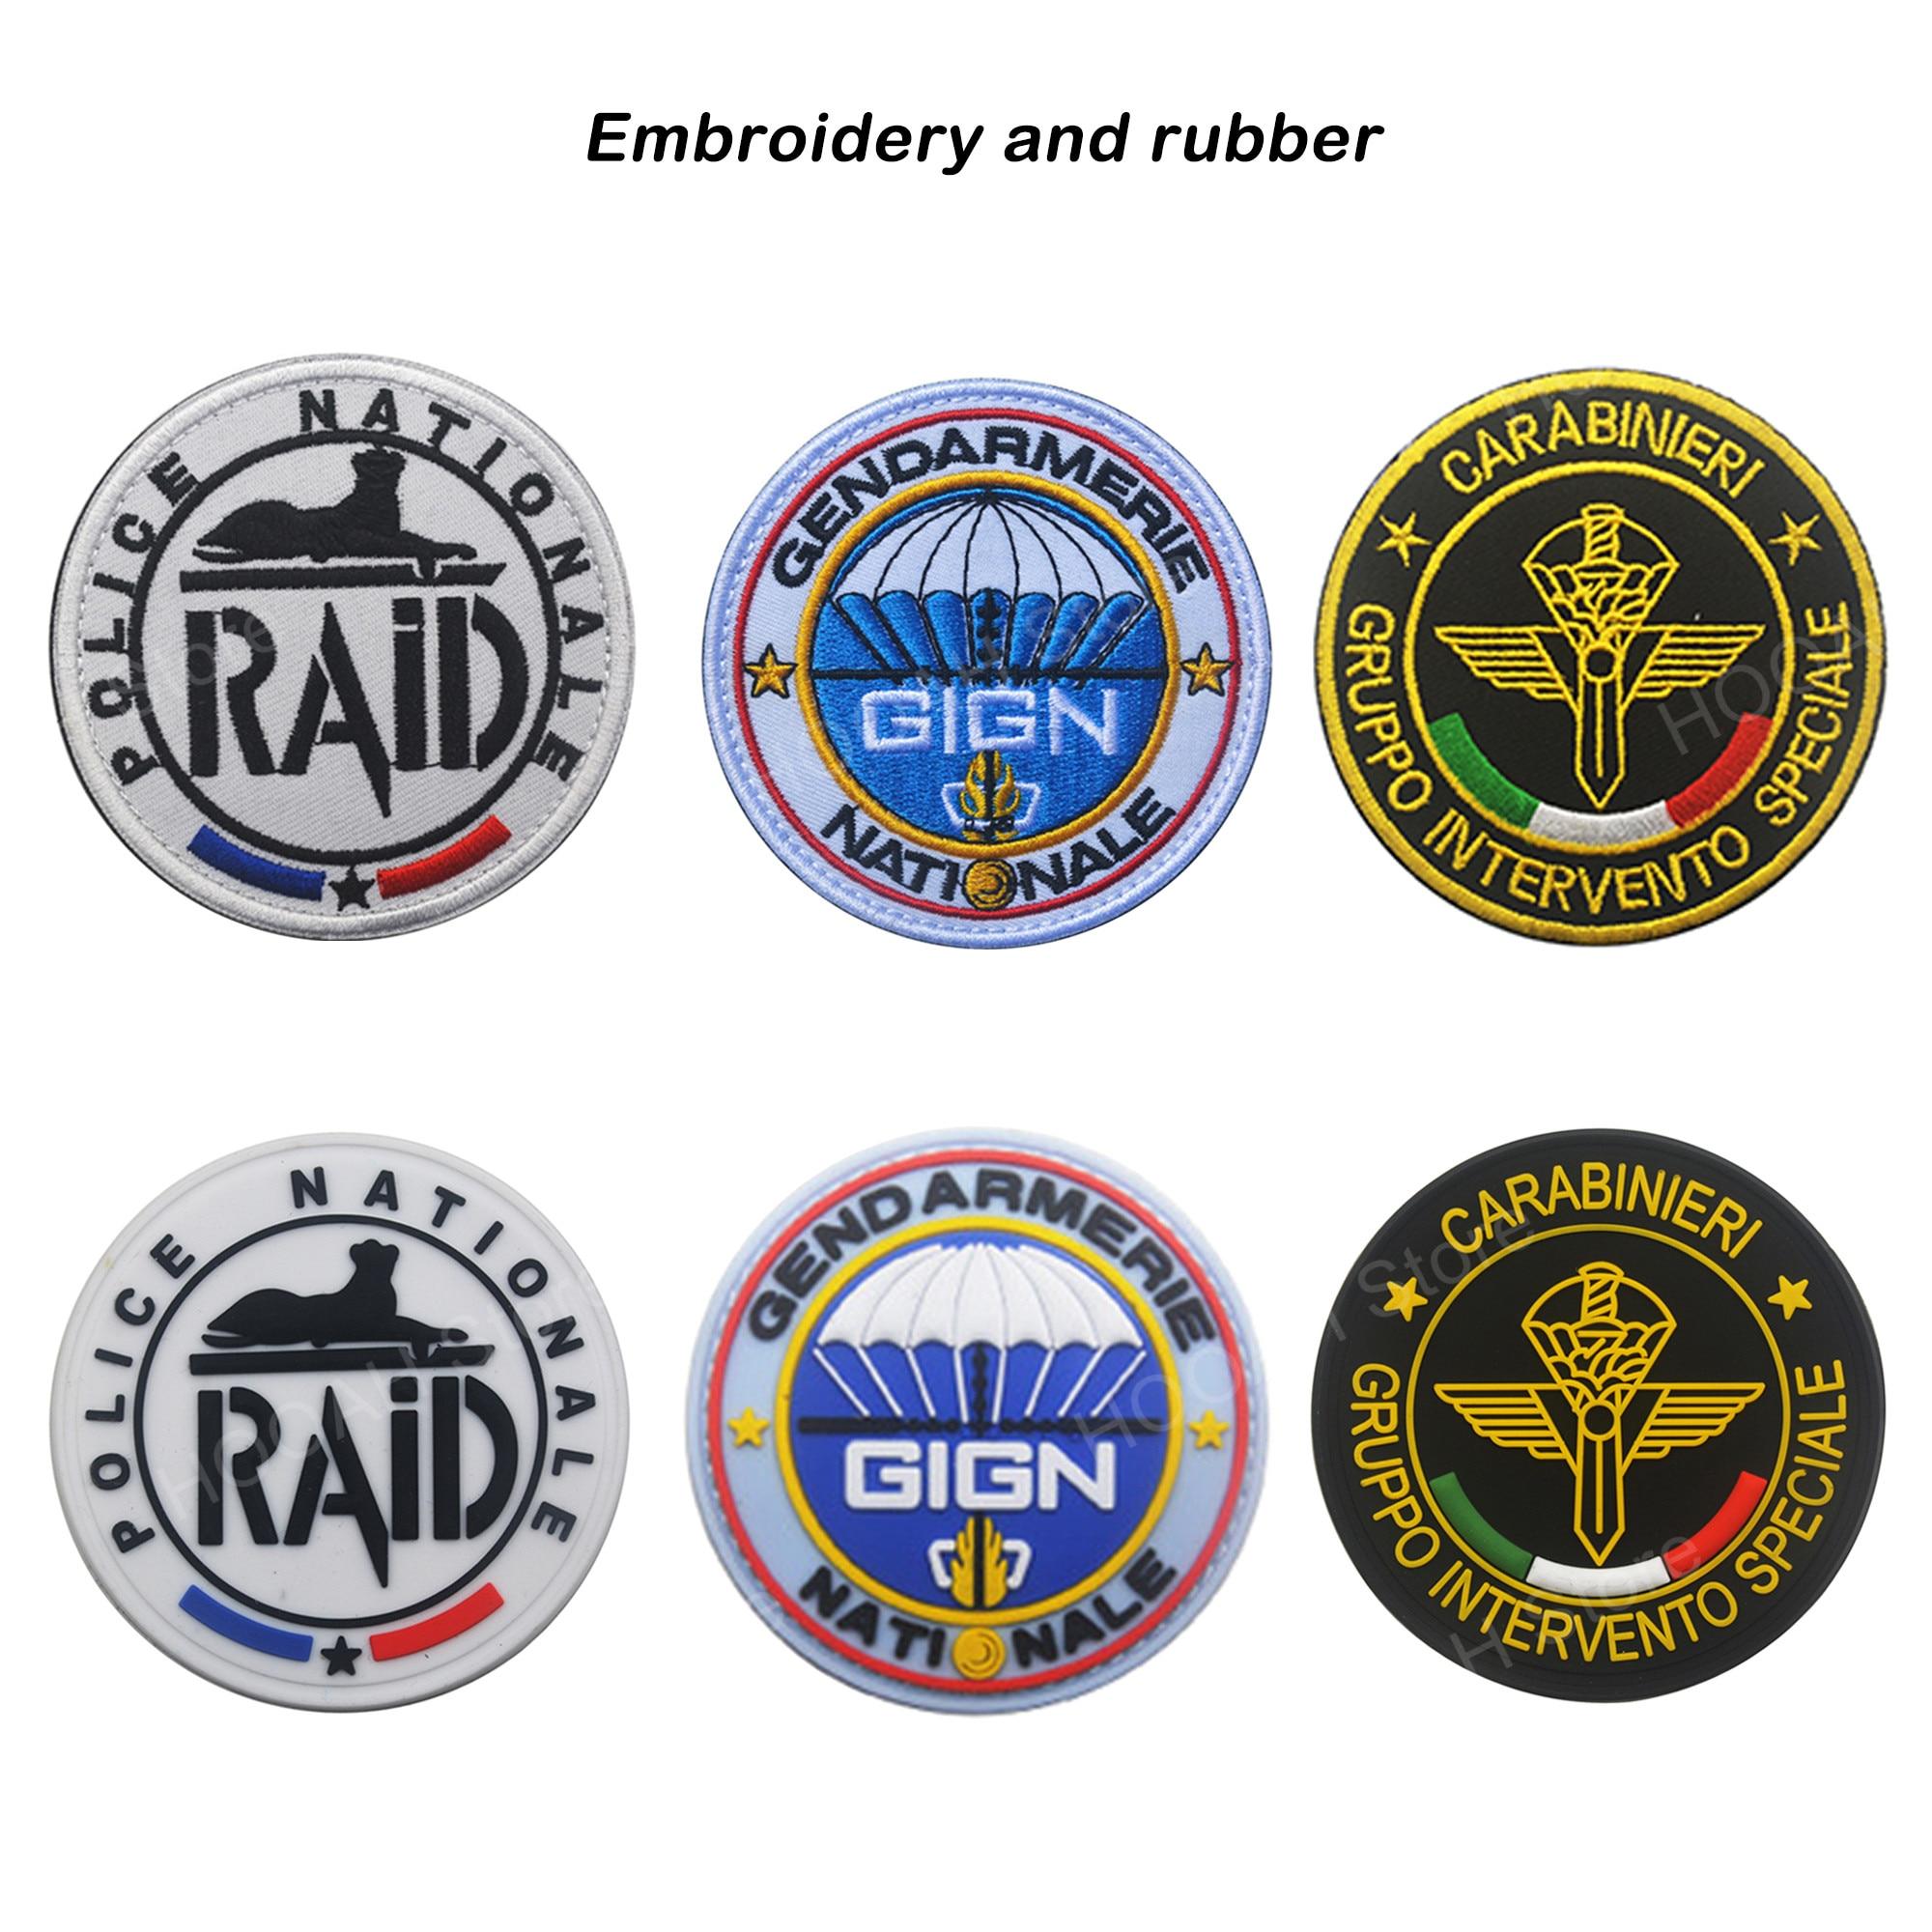 Parche bordado italiano de Italia, parche bordado francés, parches militares, parche táctico de escudo de combate, insignia bordada de goma de PVC